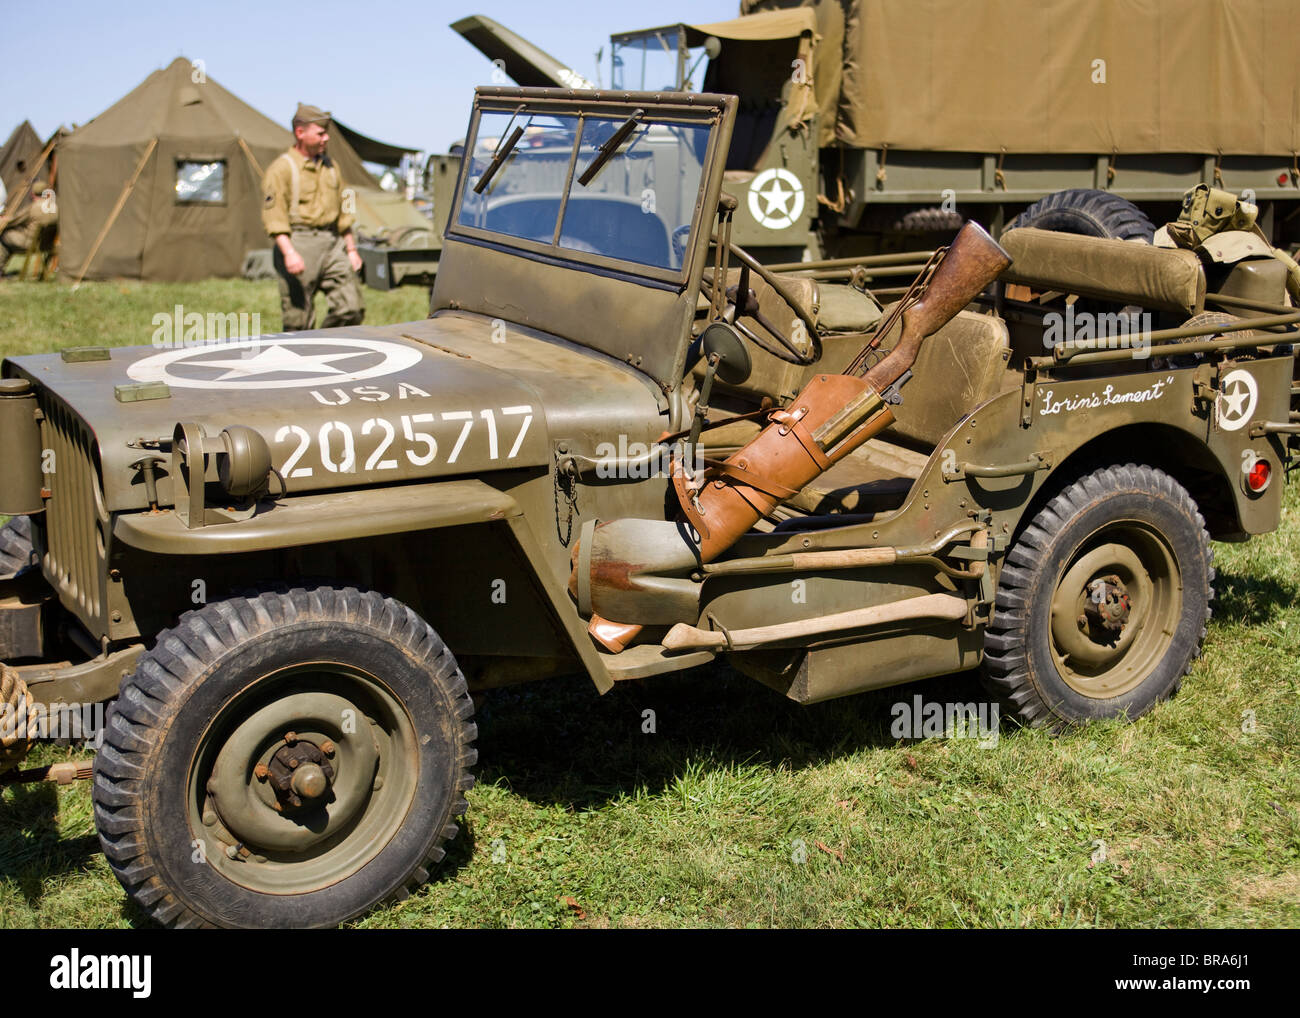 la segunda guerra mundial era us army willys jeep foto. Black Bedroom Furniture Sets. Home Design Ideas